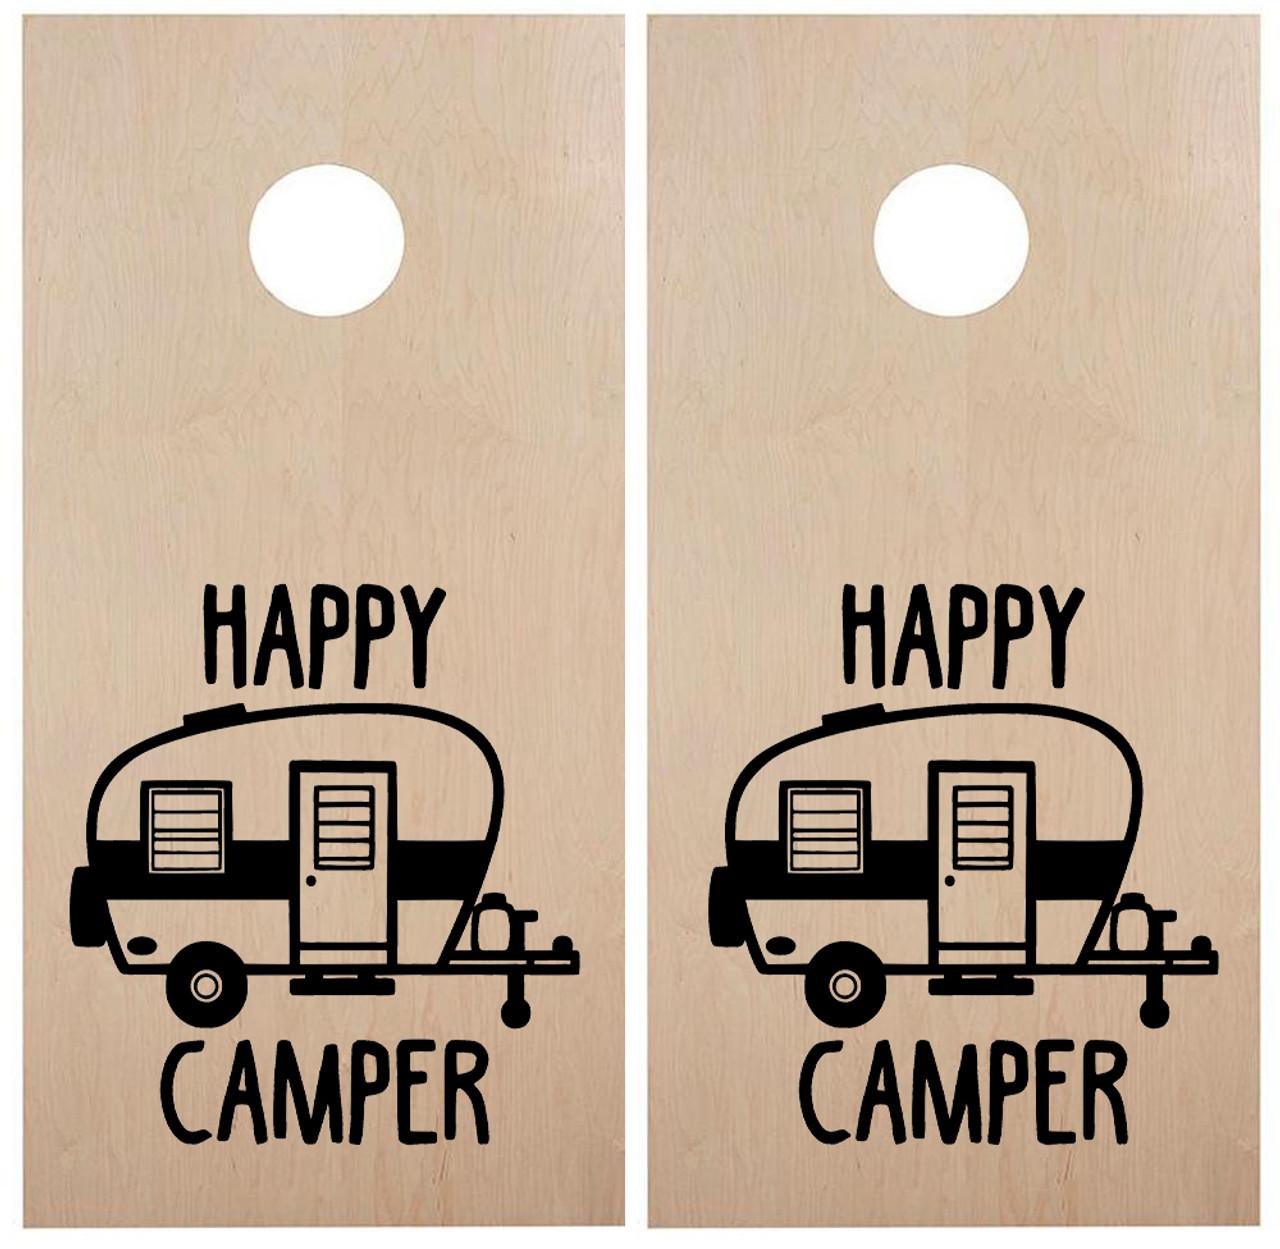 Happy Camper Cornhole Board Decals - Campground Travel Trailer - Die Cut Stickers